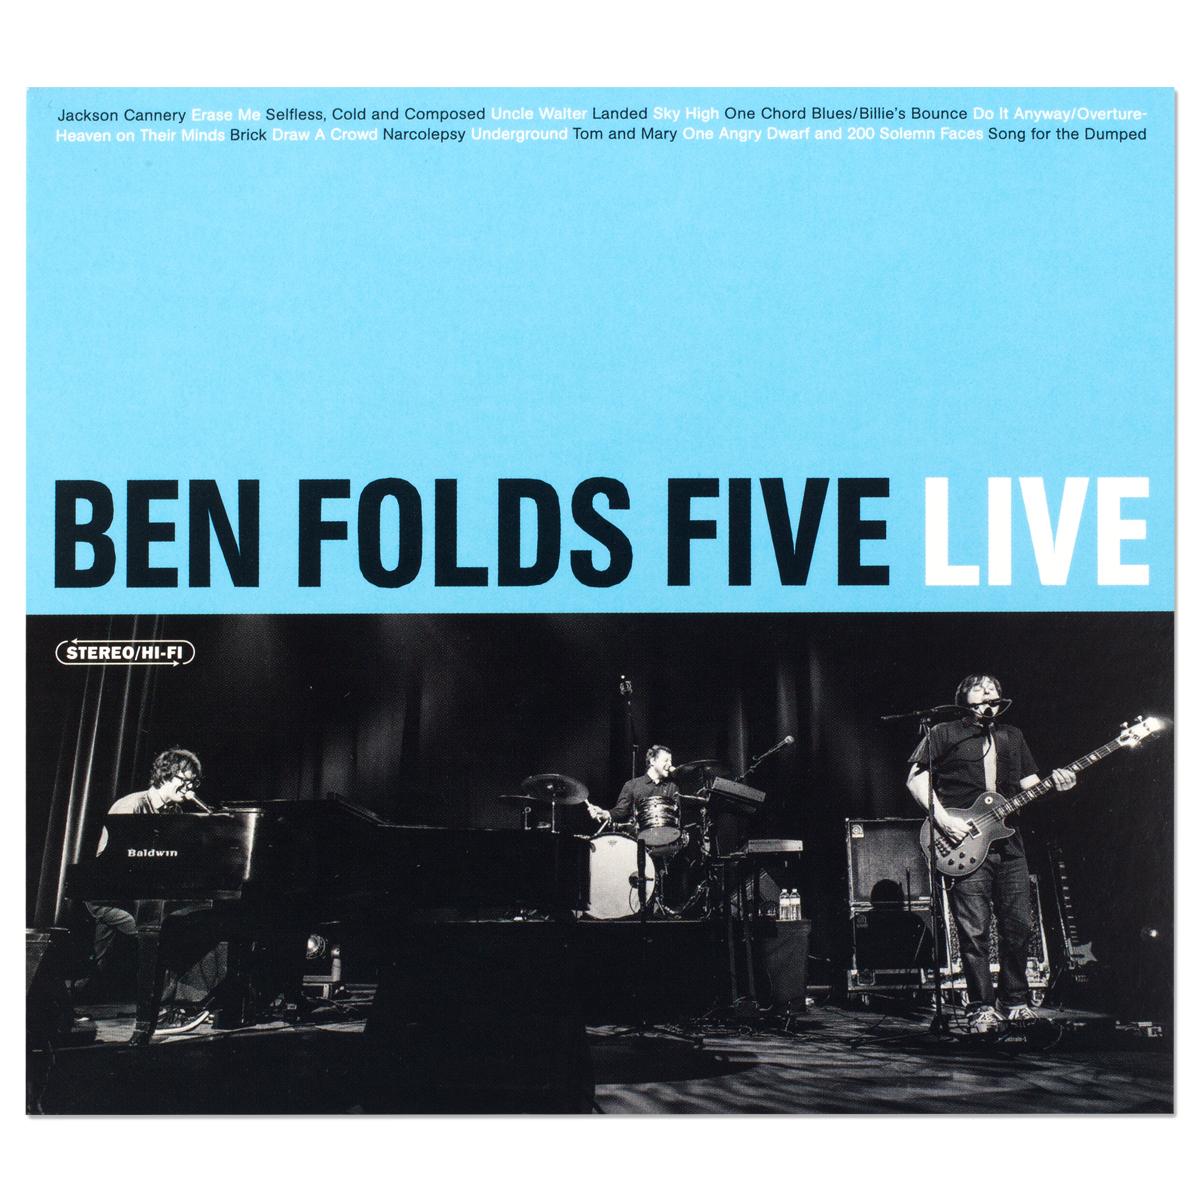 Ben Folds Five Live CD